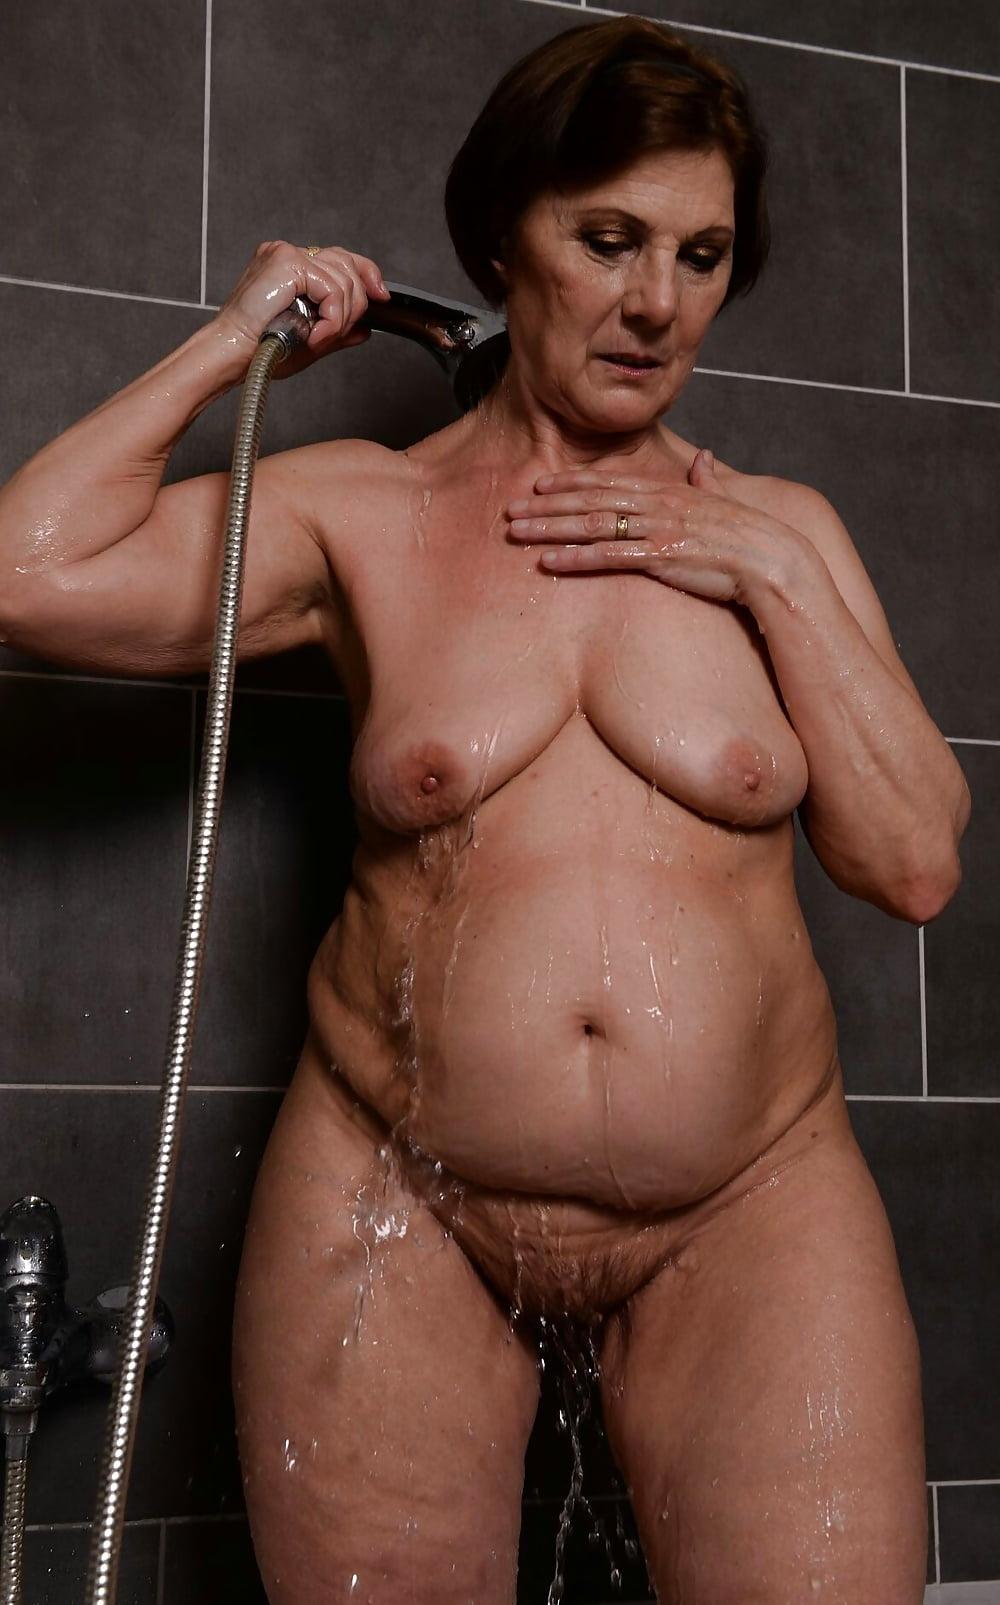 grandma-sexy-shower-pic